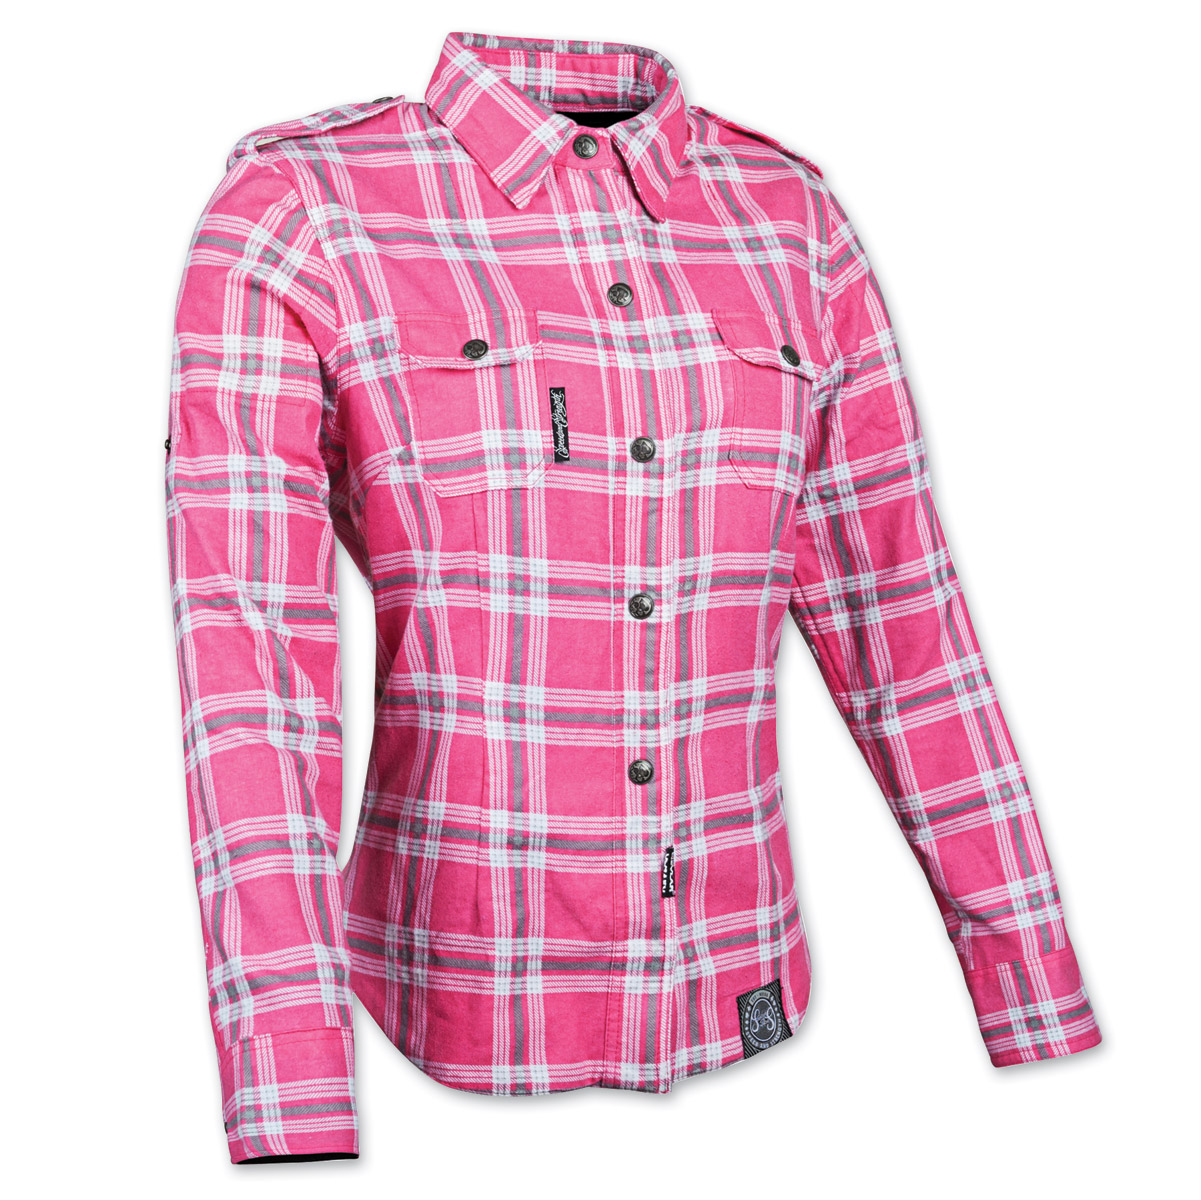 Women's Smokin' Aces Pink/White Flannel Jacket